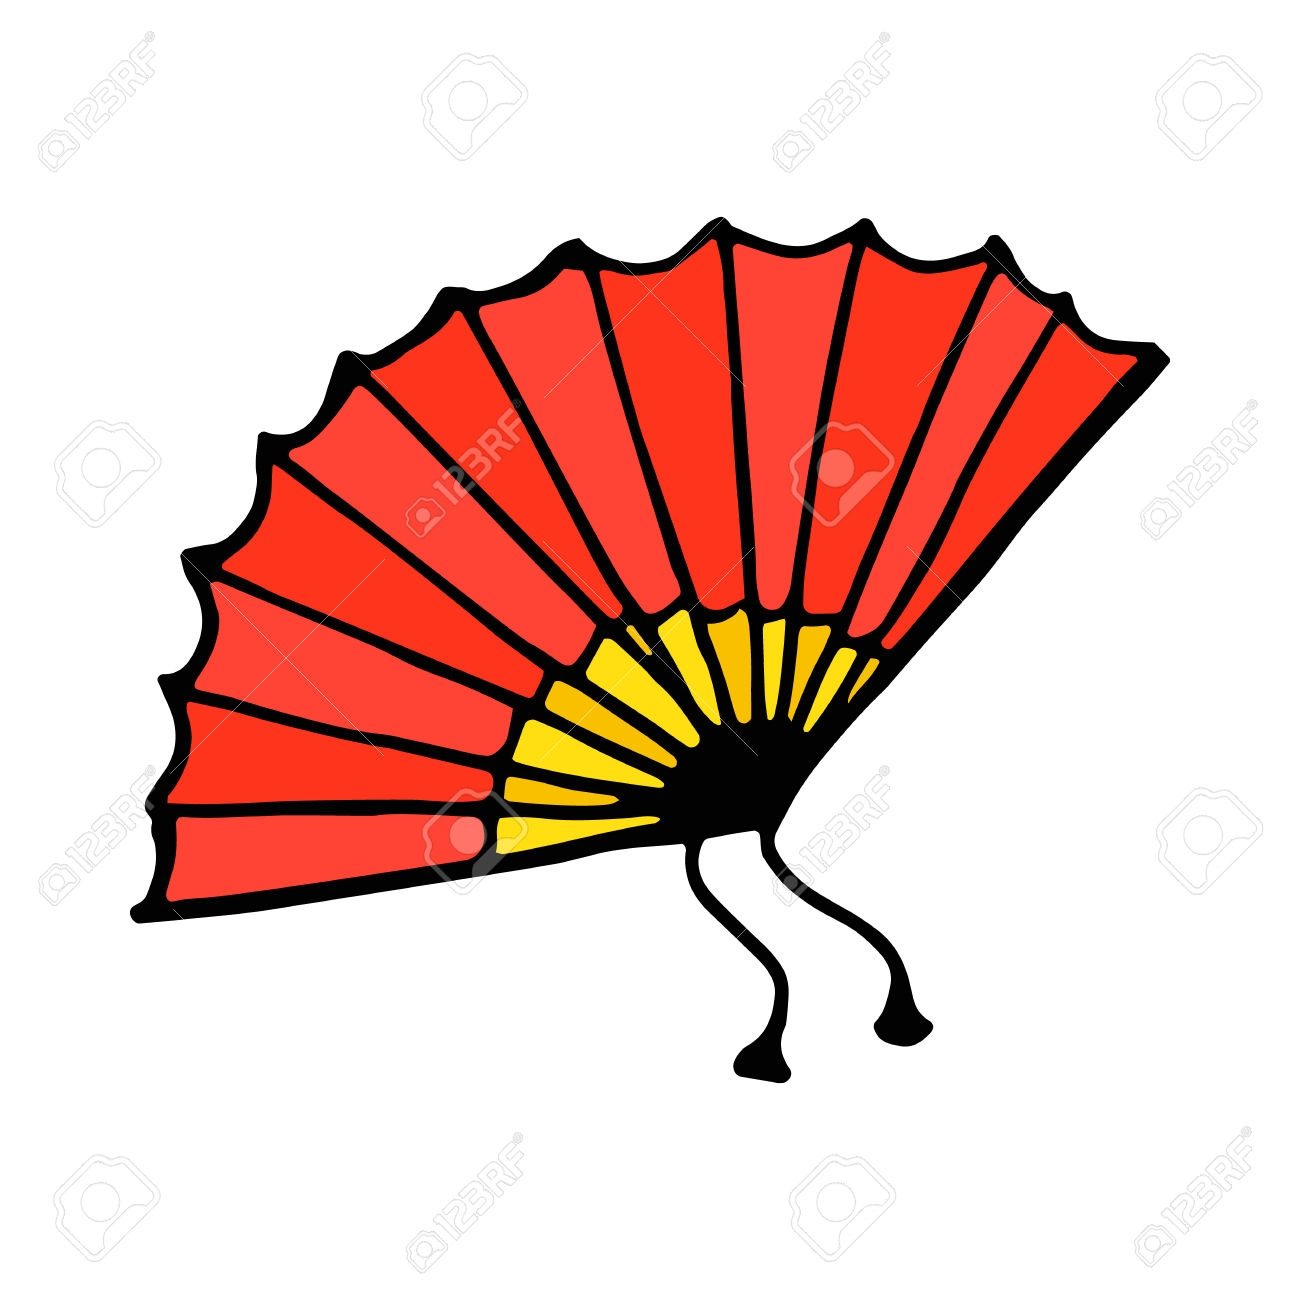 fan clipart - 3 - c - Fan clipart flamenco Pencil and in color fan clipart